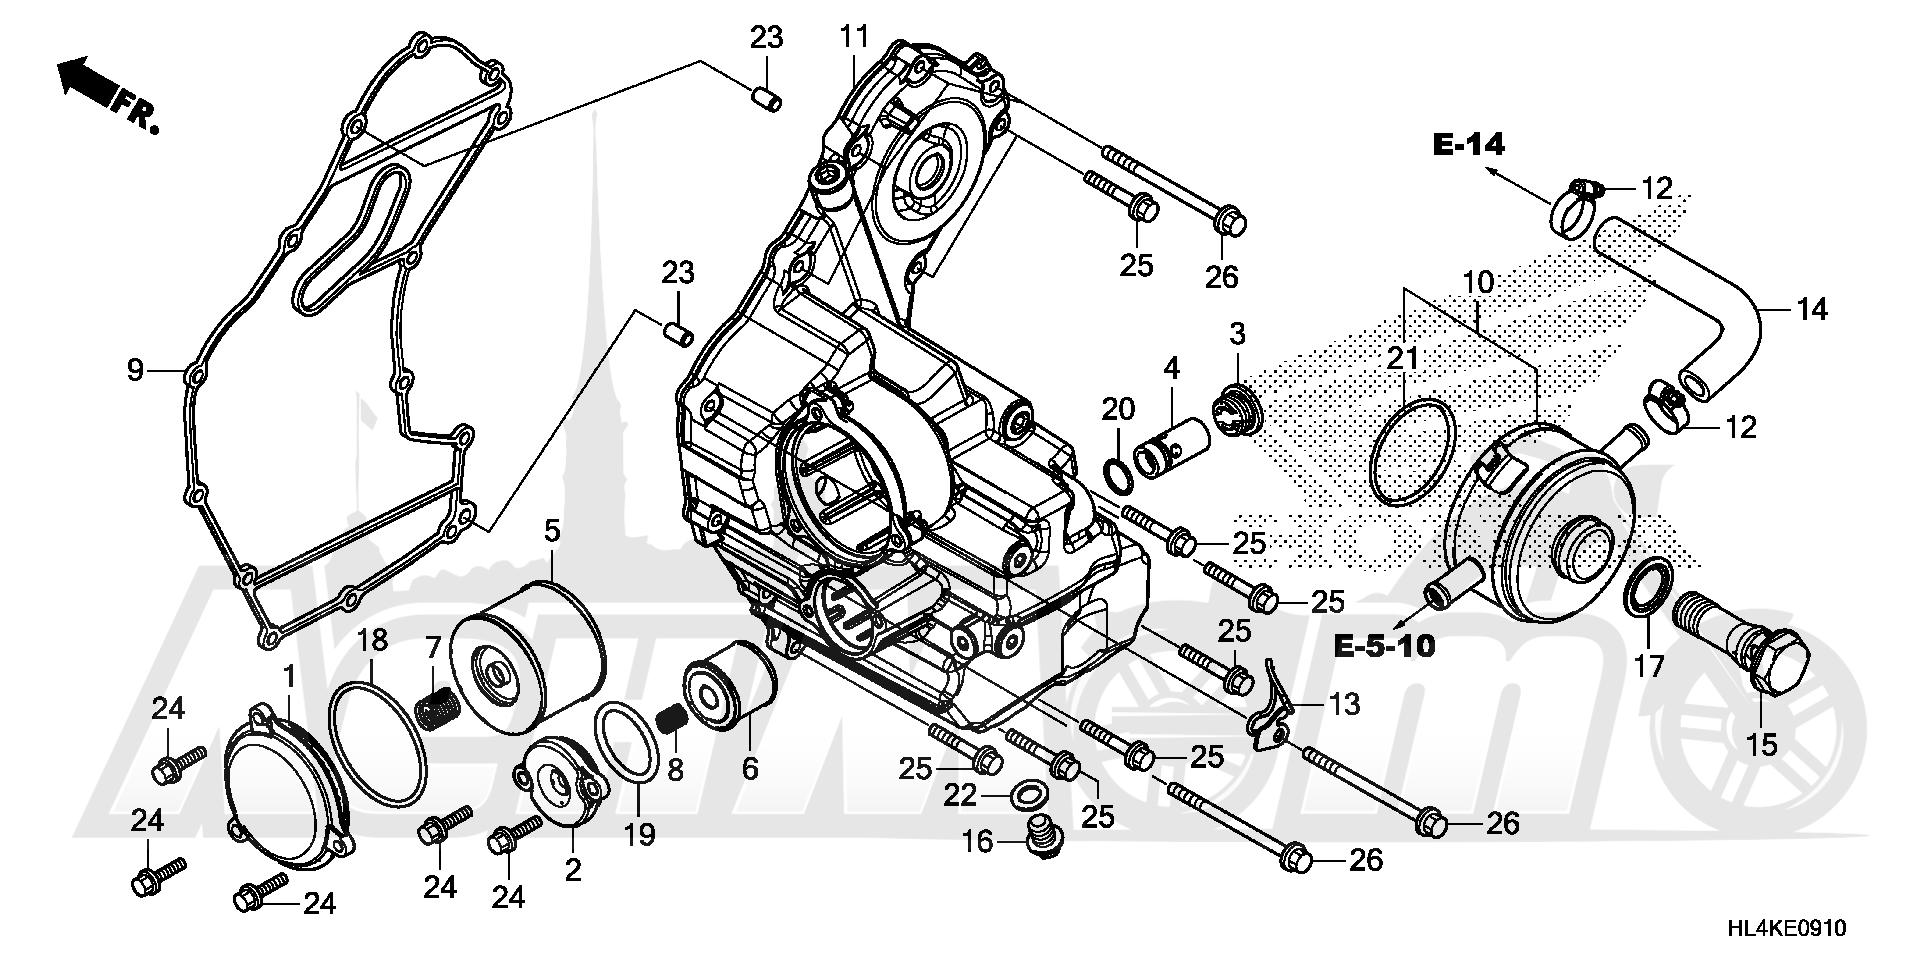 Запчасти для Квадроцикла Honda 2019 SXS1000M5D Раздел: OIL COOLER | маслянный радиатор